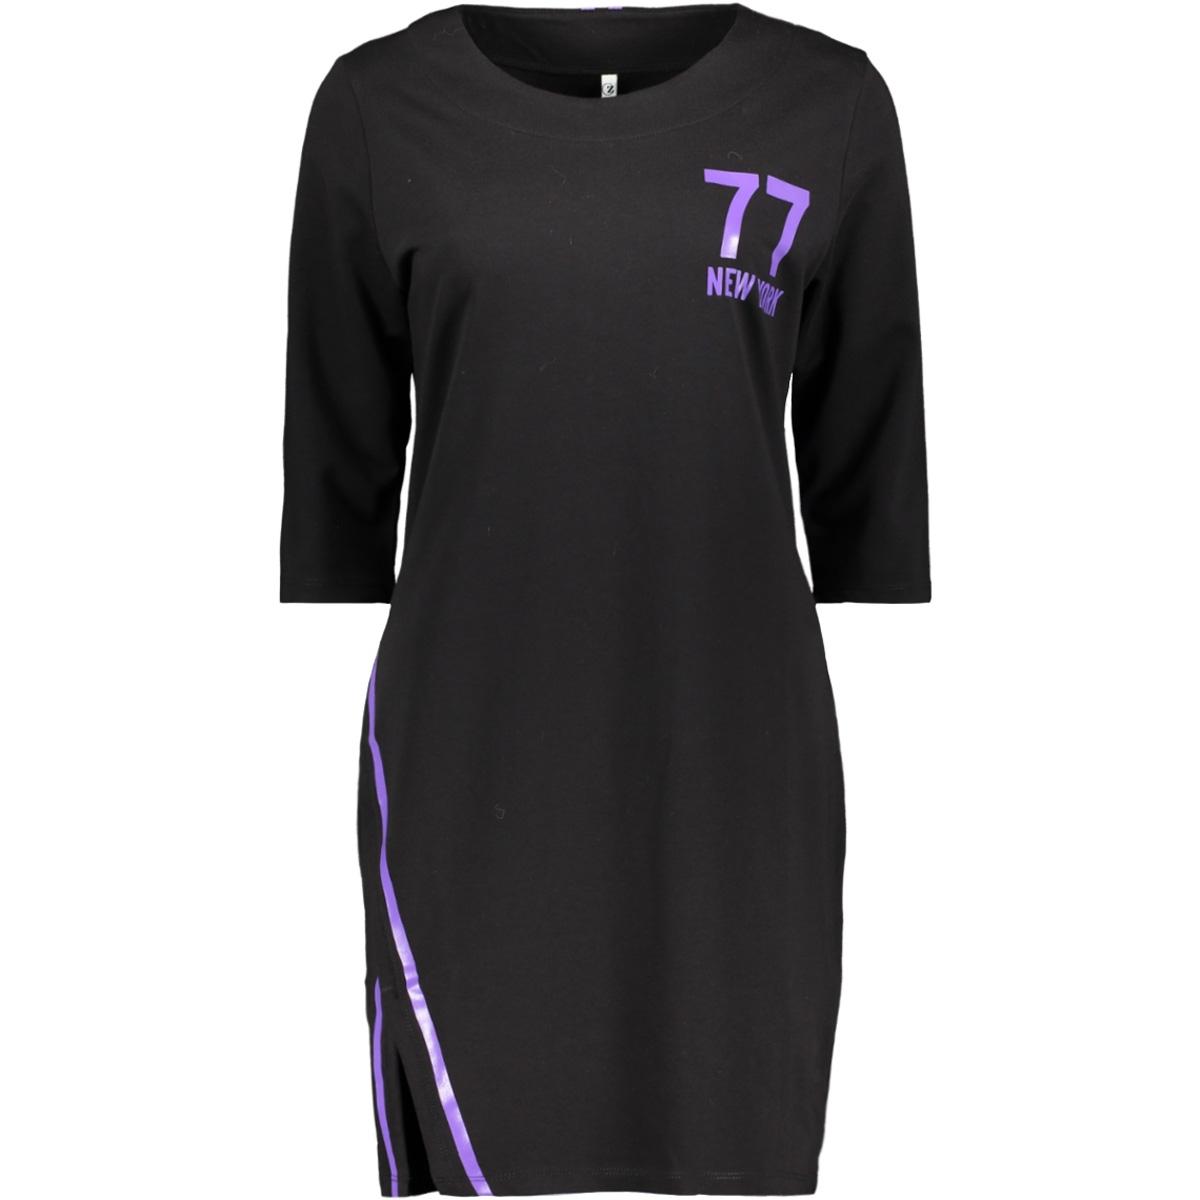 new york sporty tunic zoso tuniek black/purple